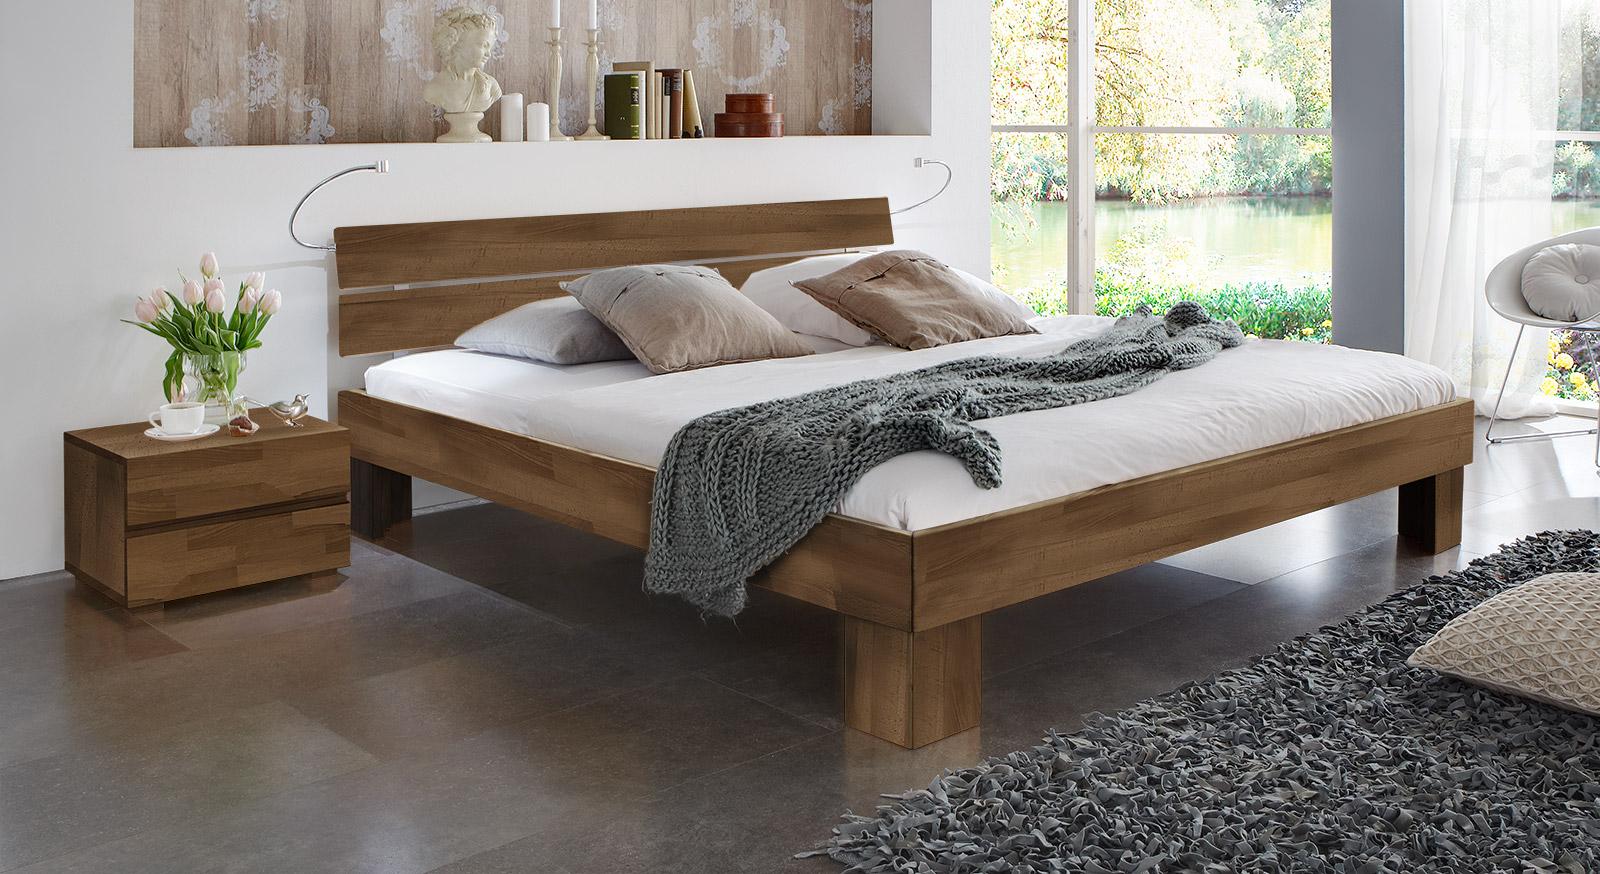 Full Size of Seniorenbett Mit Elektrischem Lattenrost Gnstig Bei Bettende Bett Betten.de